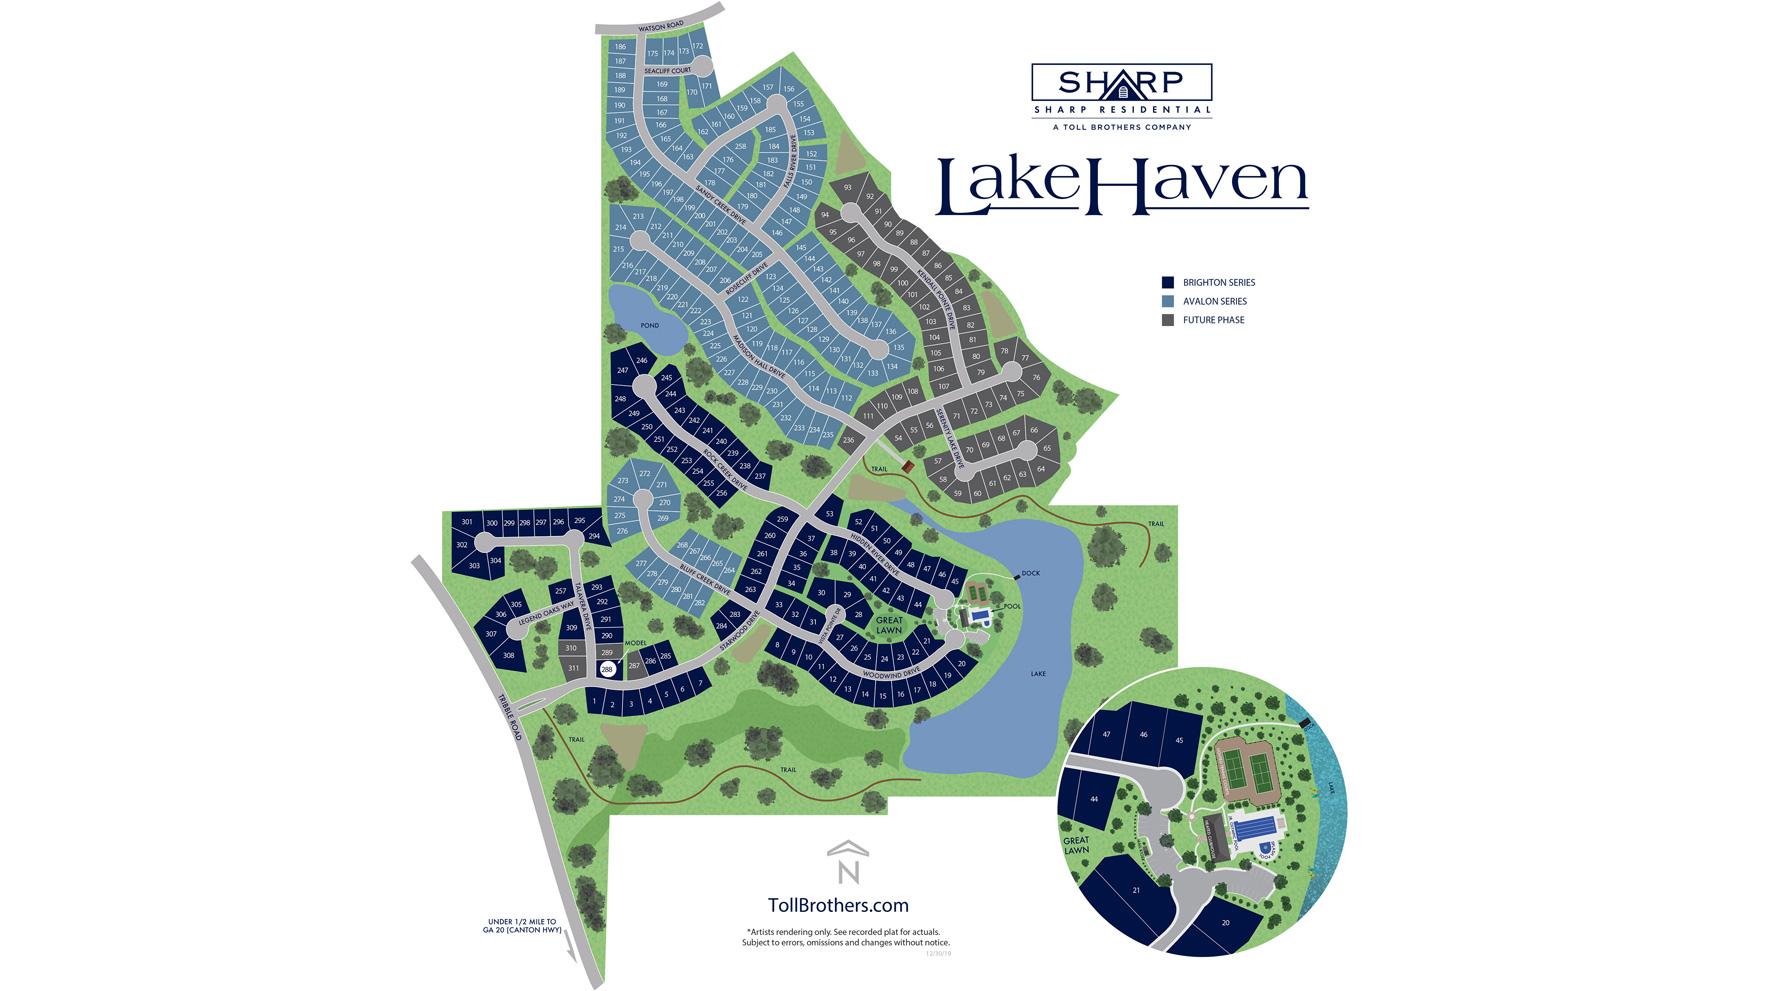 LakeHaven Overall Site Plan